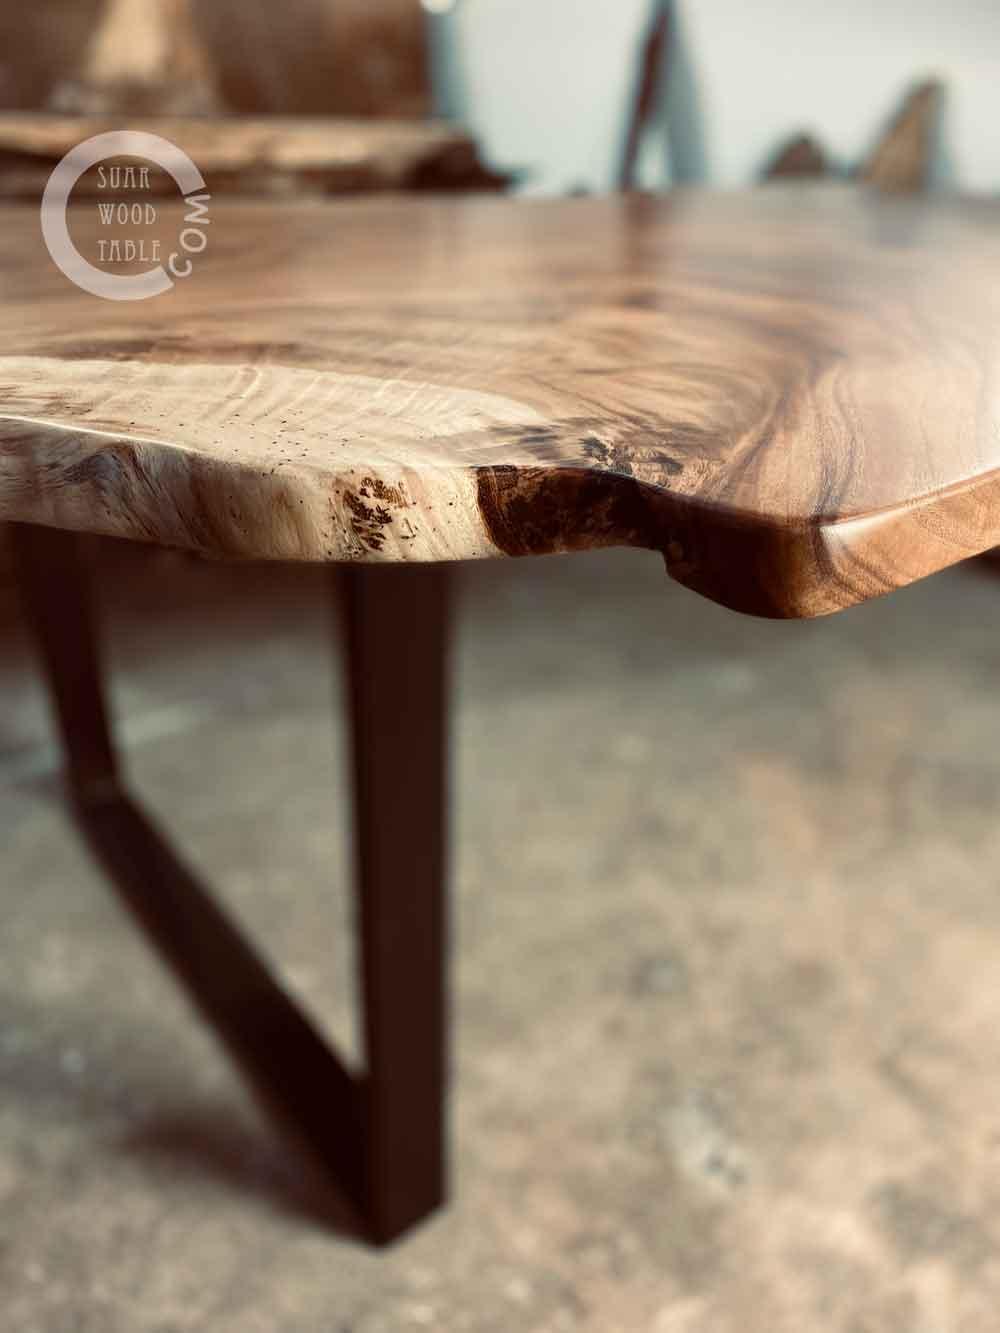 self-made wood table